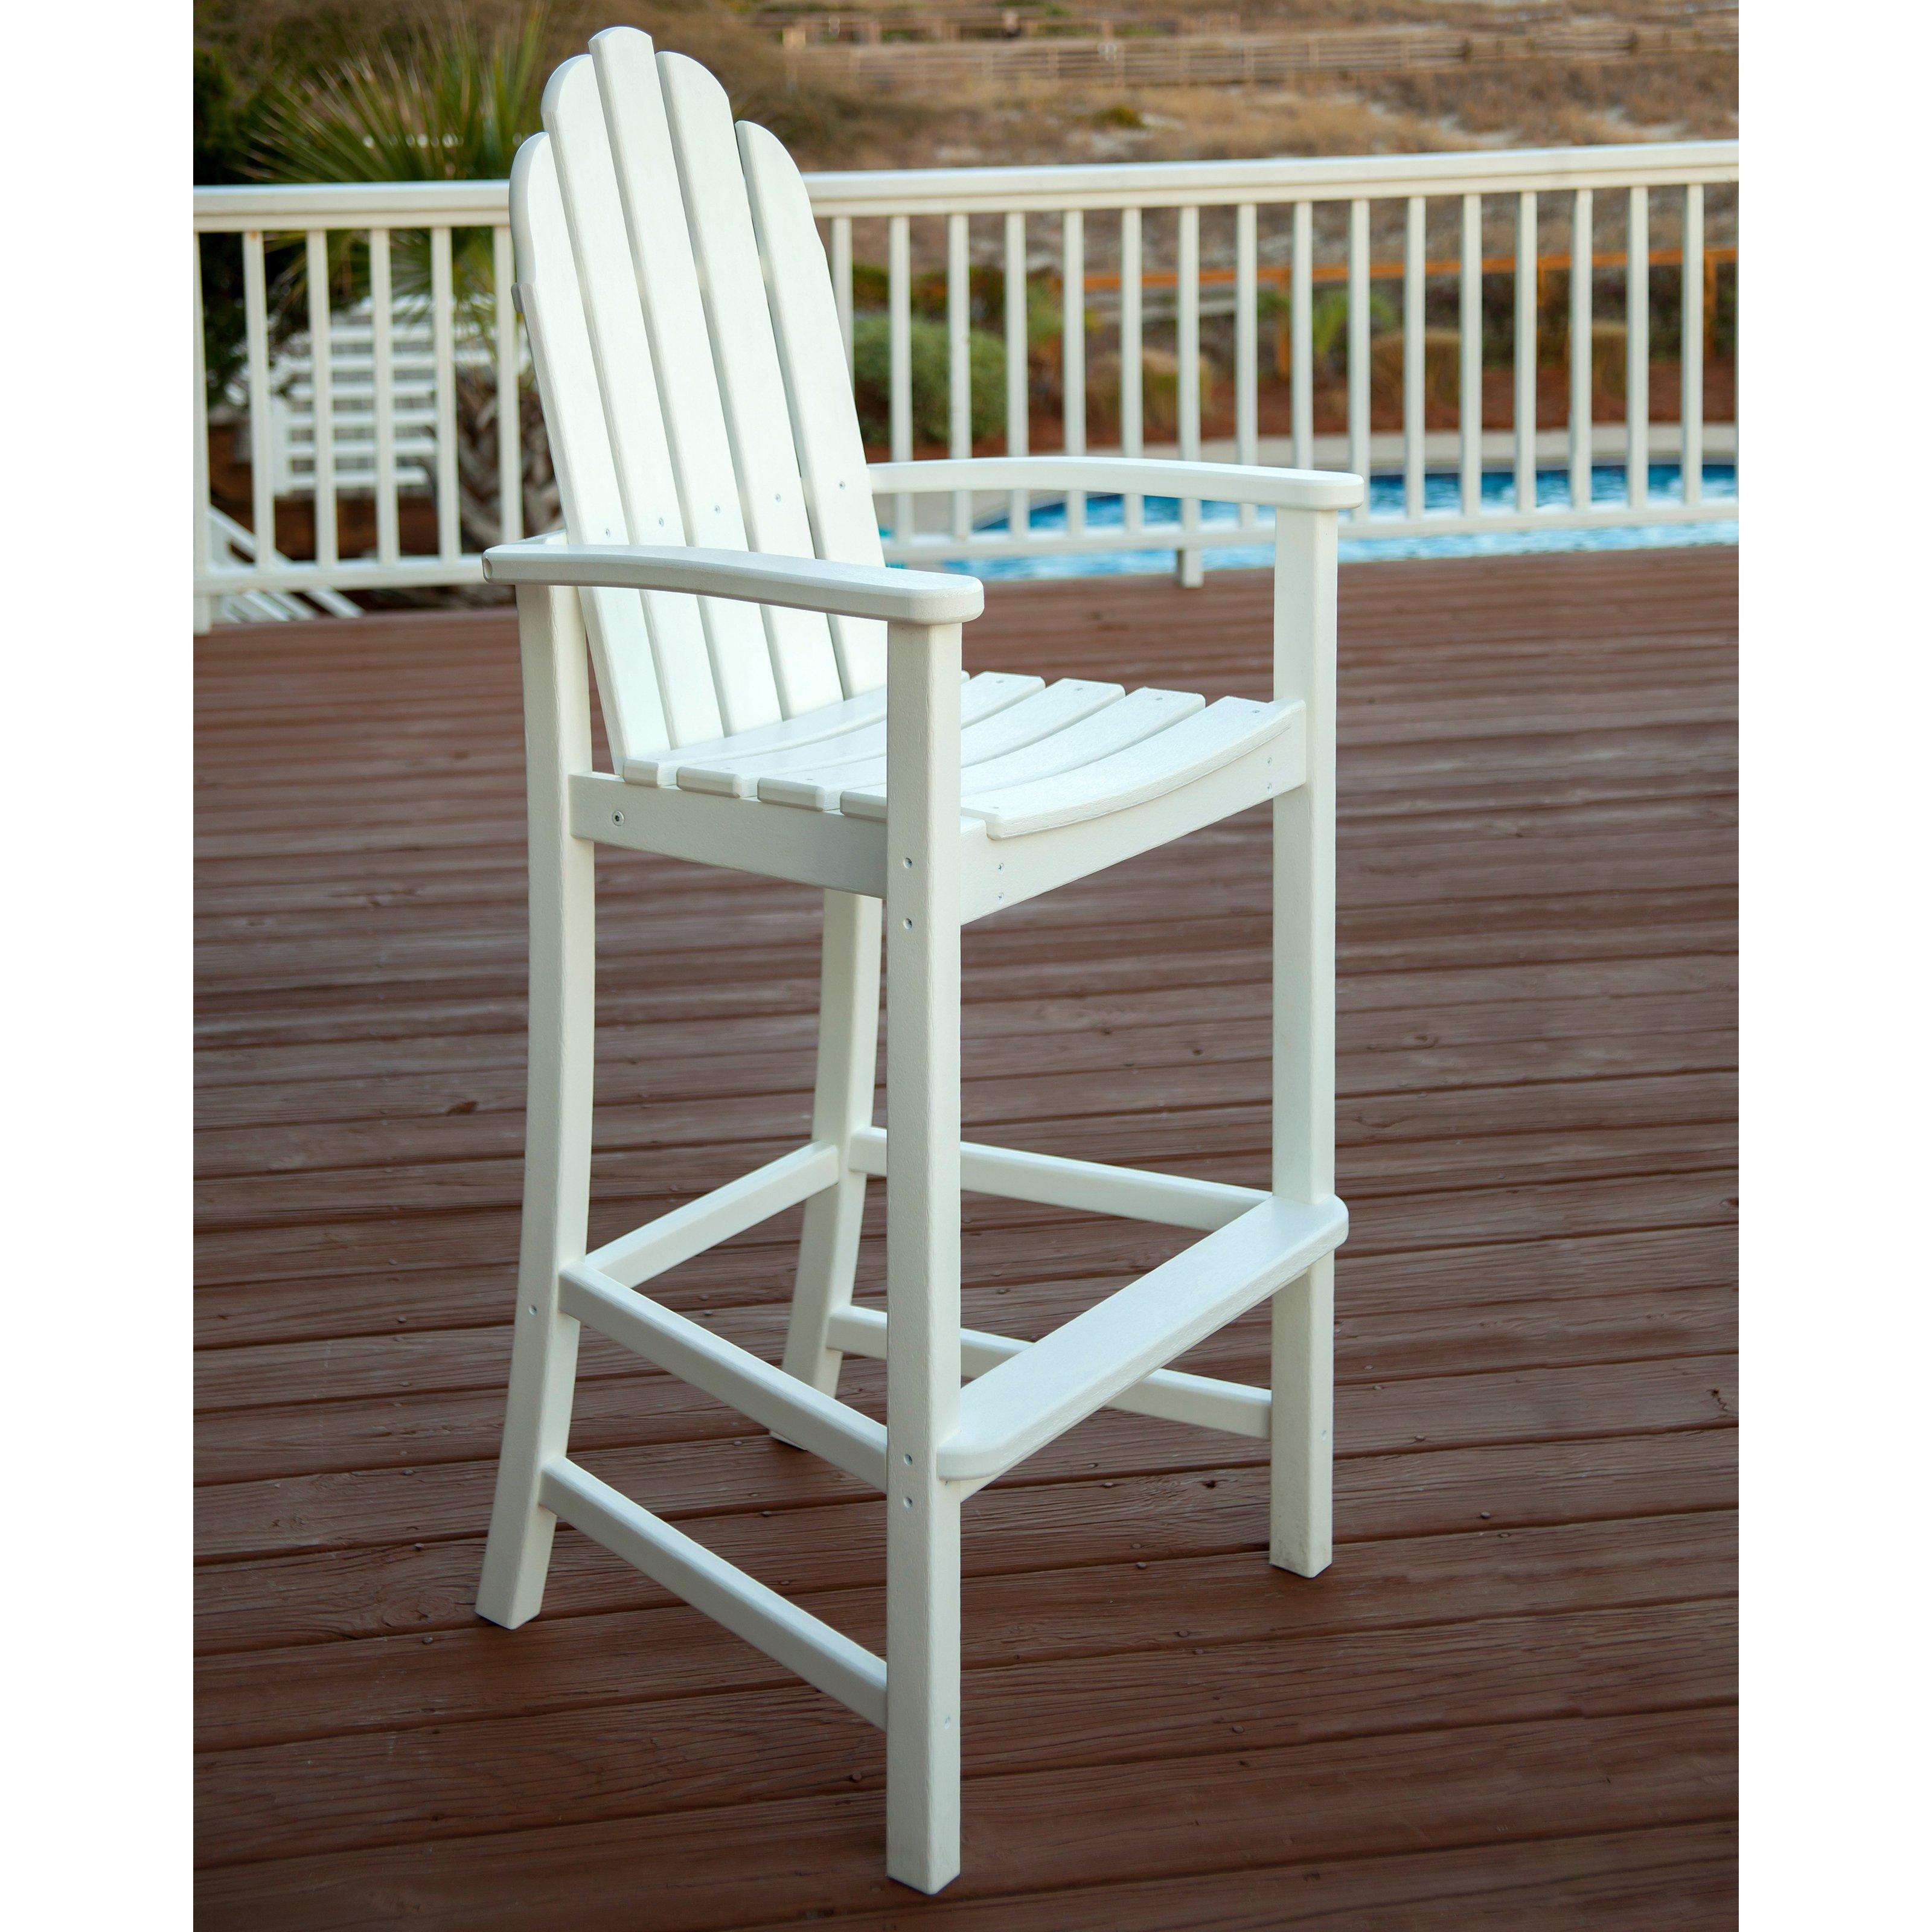 POLYWOODu0026reg; Adirondack Recycled Plastic Bar Height Chair   Walmart.com